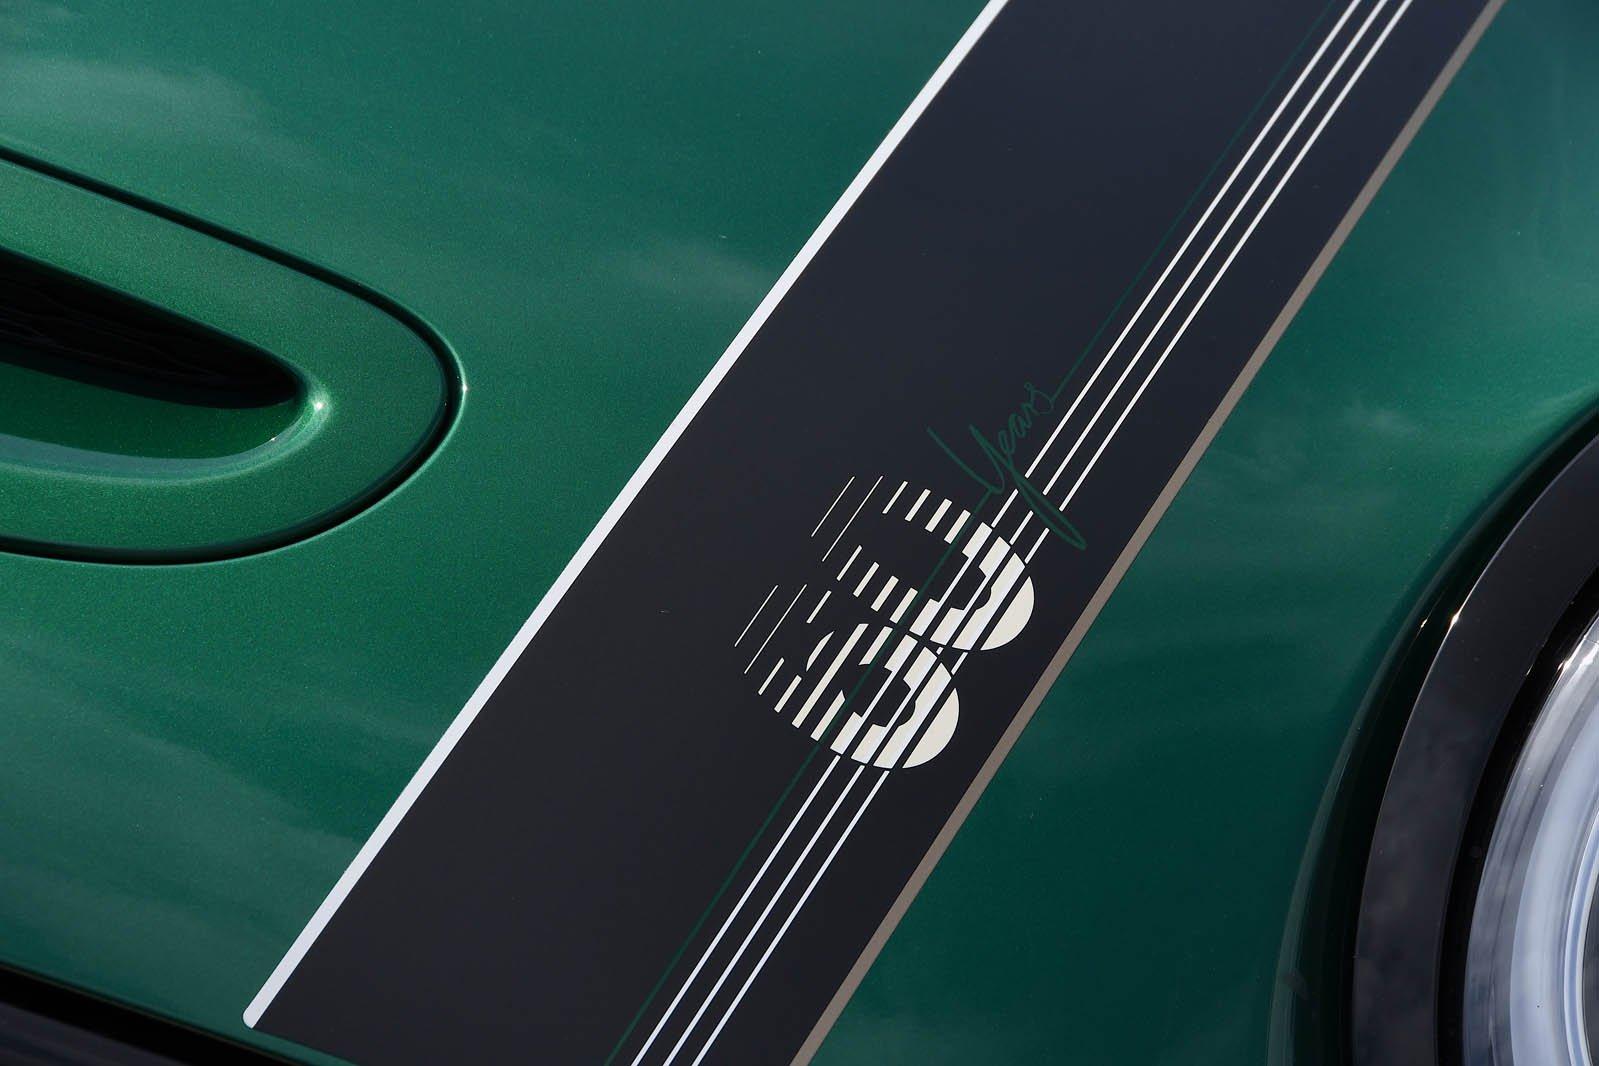 Mini Cooper S 60 Year Edition bonnet